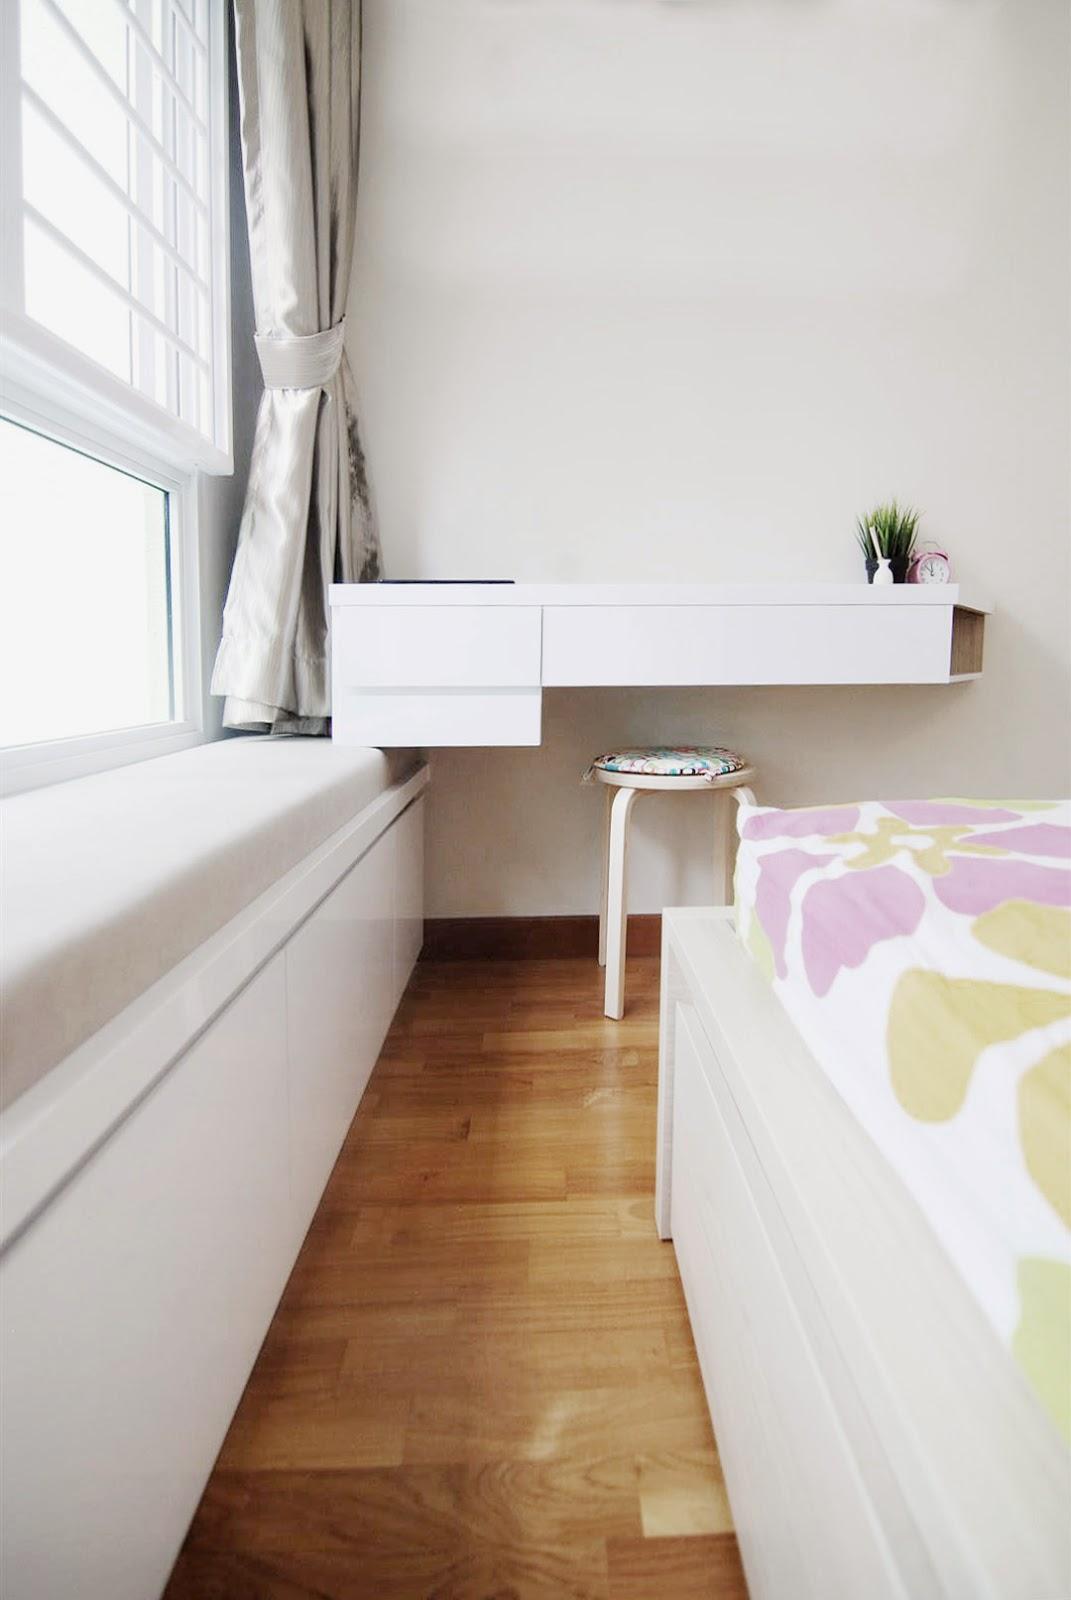 Butterpaperstudio reno ancilla bto final photos of the - Master bedroom study table ...